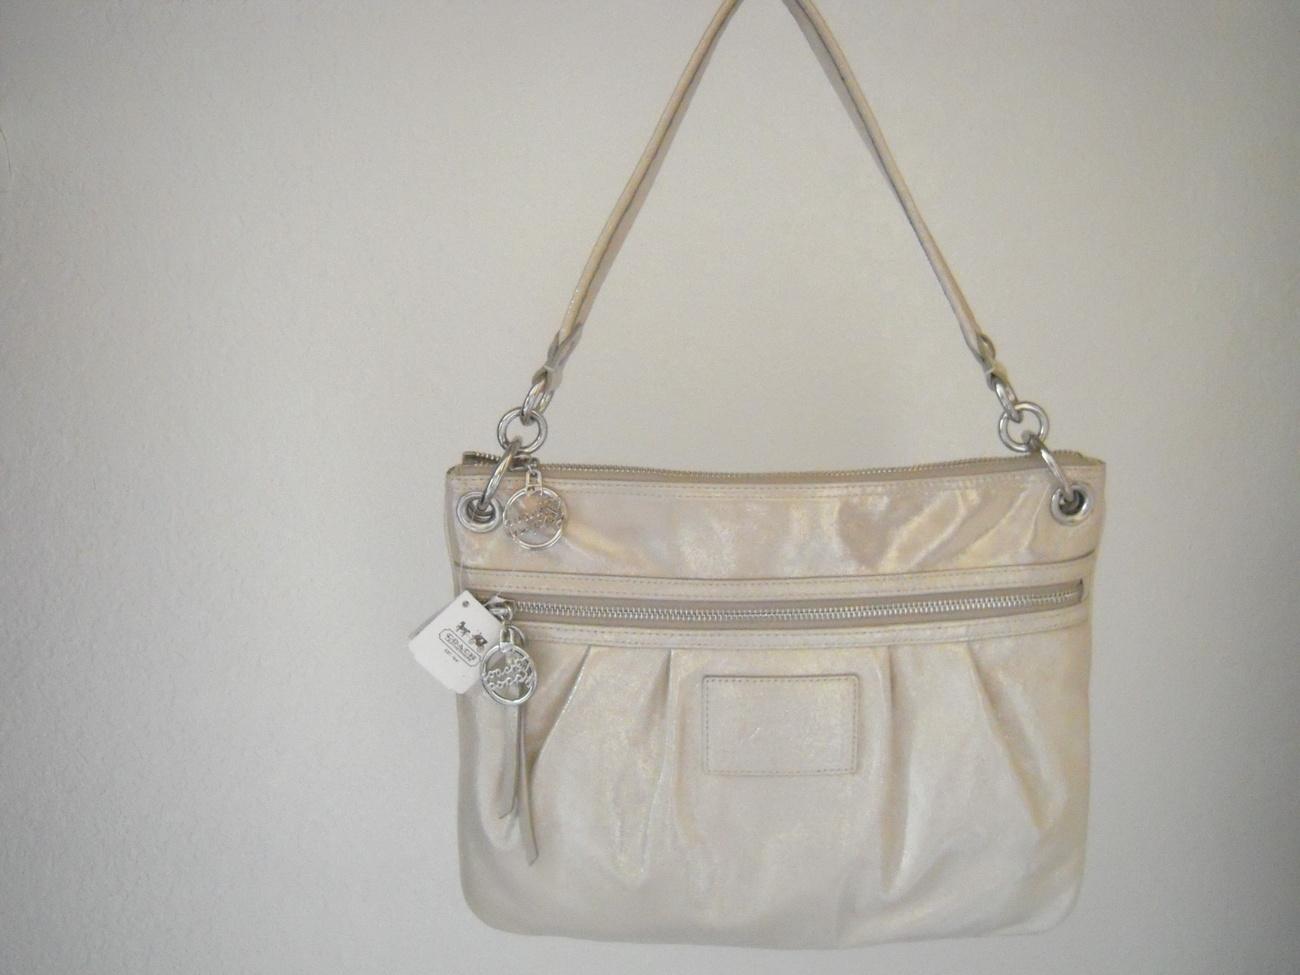 1df02b5ca96 chanel 1115 handbags replica chanel 1113 handbags for men online